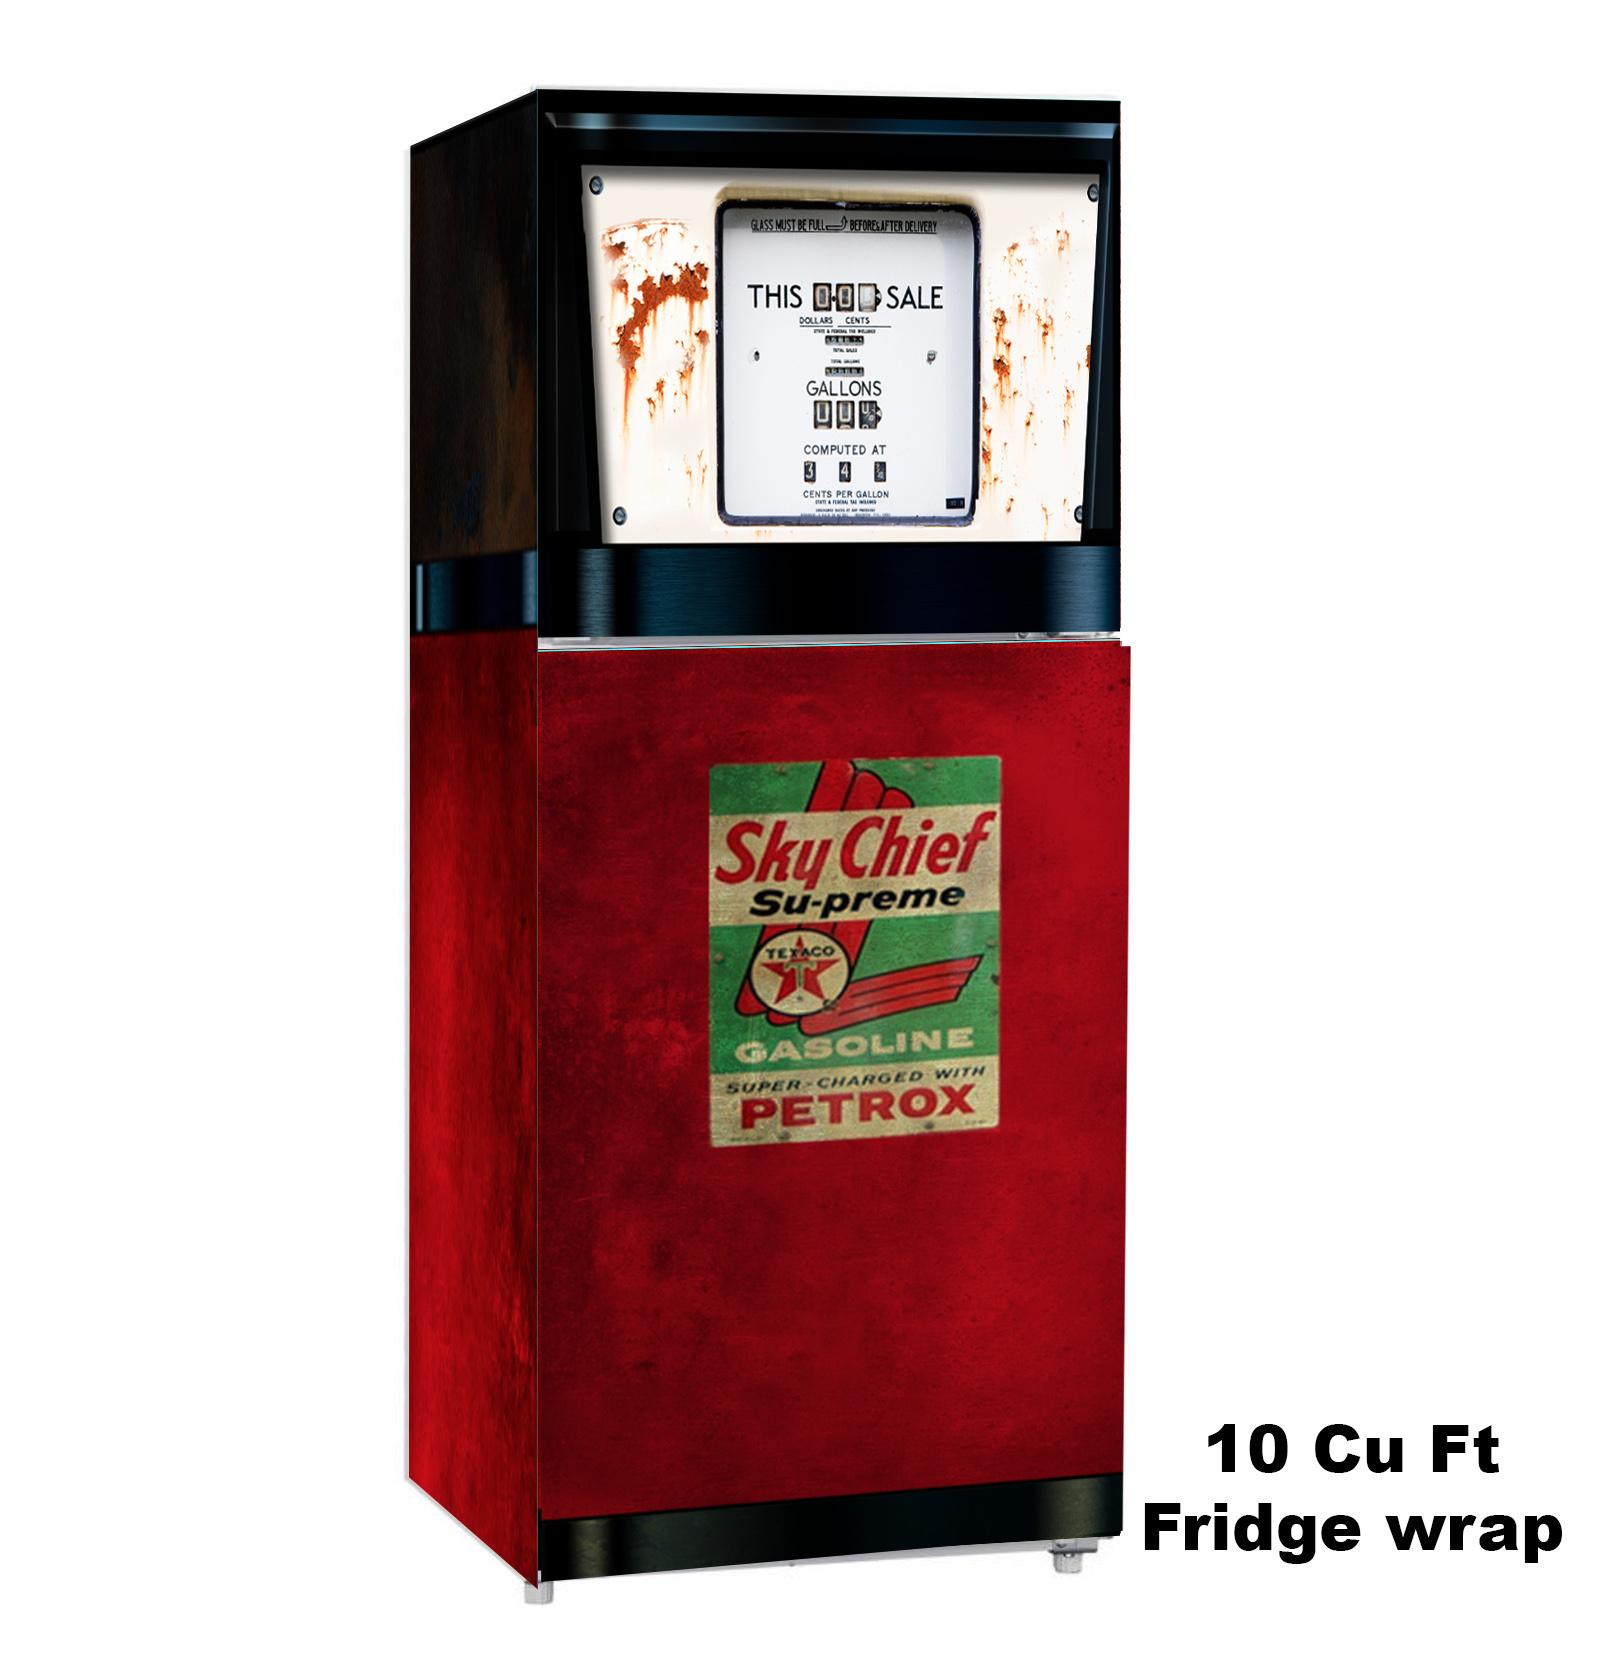 sky chief ,Texaco, gas Pump, 10 cu ft Fridge, rm wraps, Fridge wrap